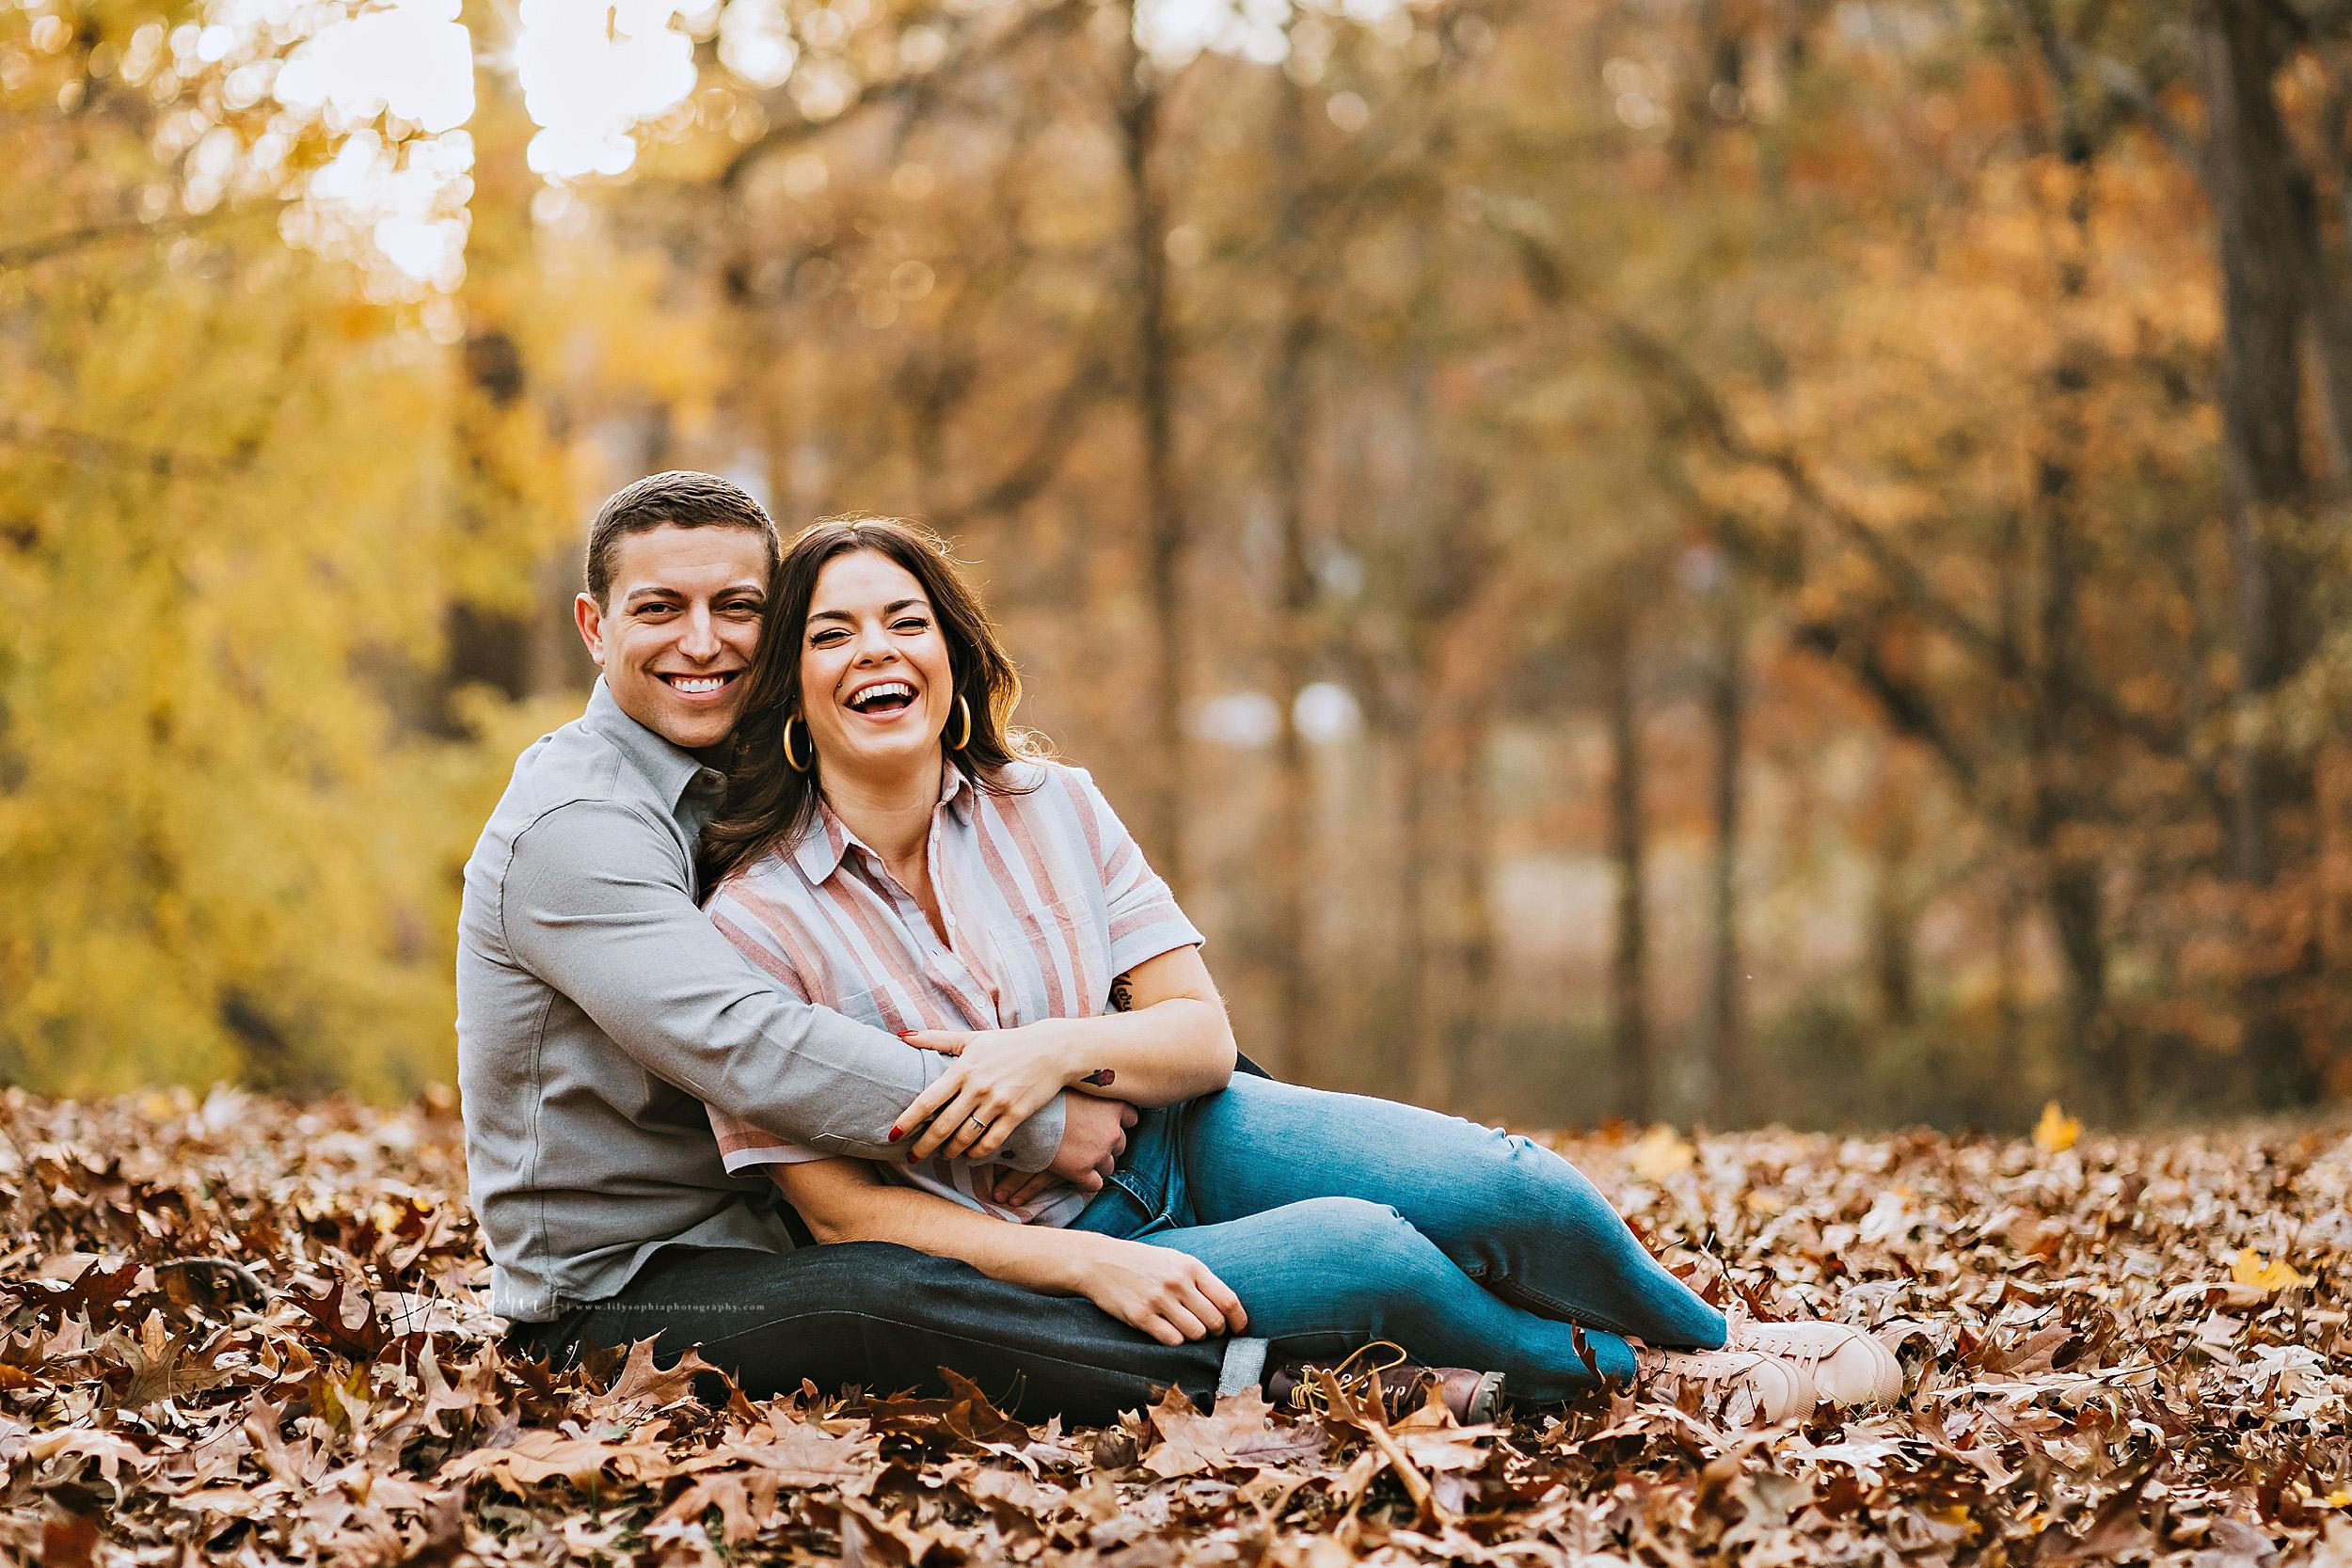 atlanta-reynoldstown-peoplestown-decatur-sandy-springs-buckhead-virginia-highlands-west-end-decatur-lily-sophia-photography-outdoor-fall-couples-photos_1483.jpg